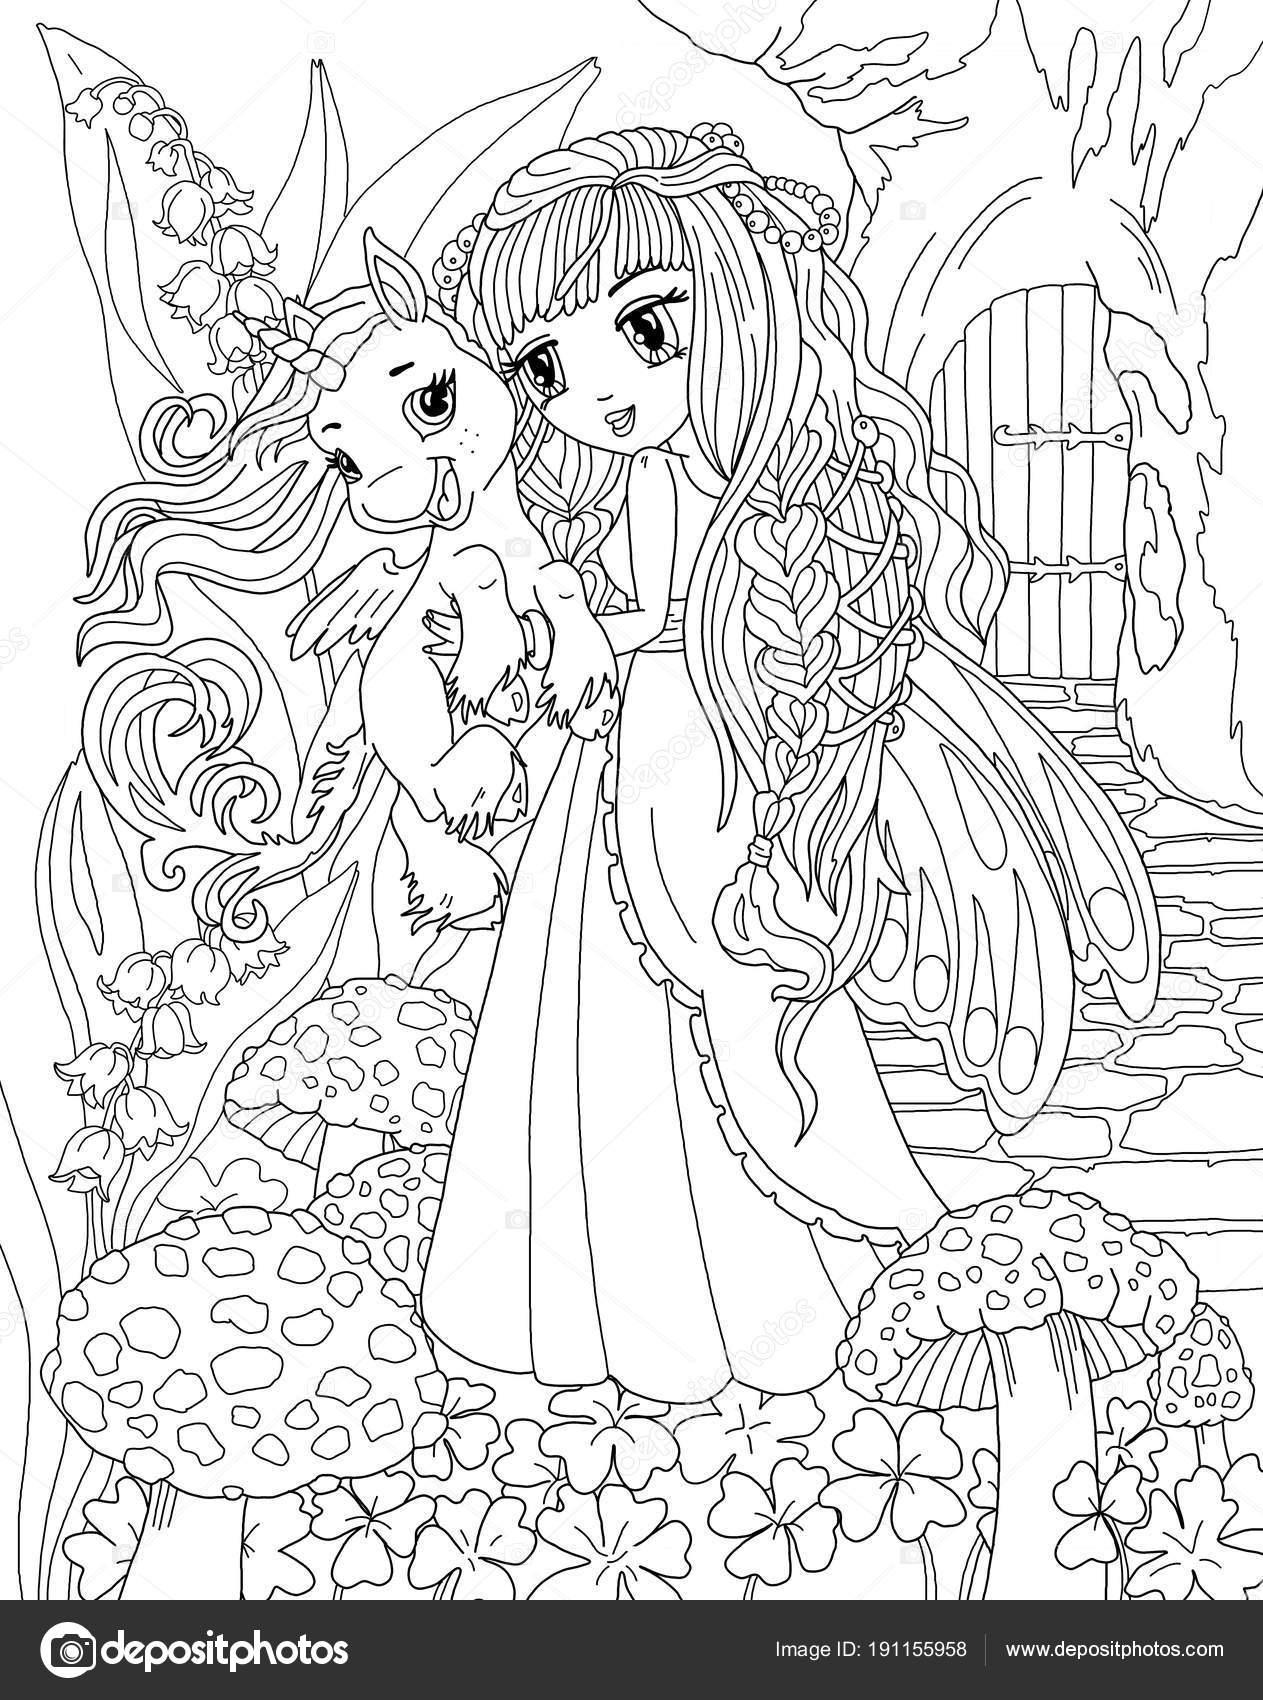 Coloriage Tete Licorne En Amour.Coloriage Licorne Princesse Photographie Larisakuzovkova C 191155958